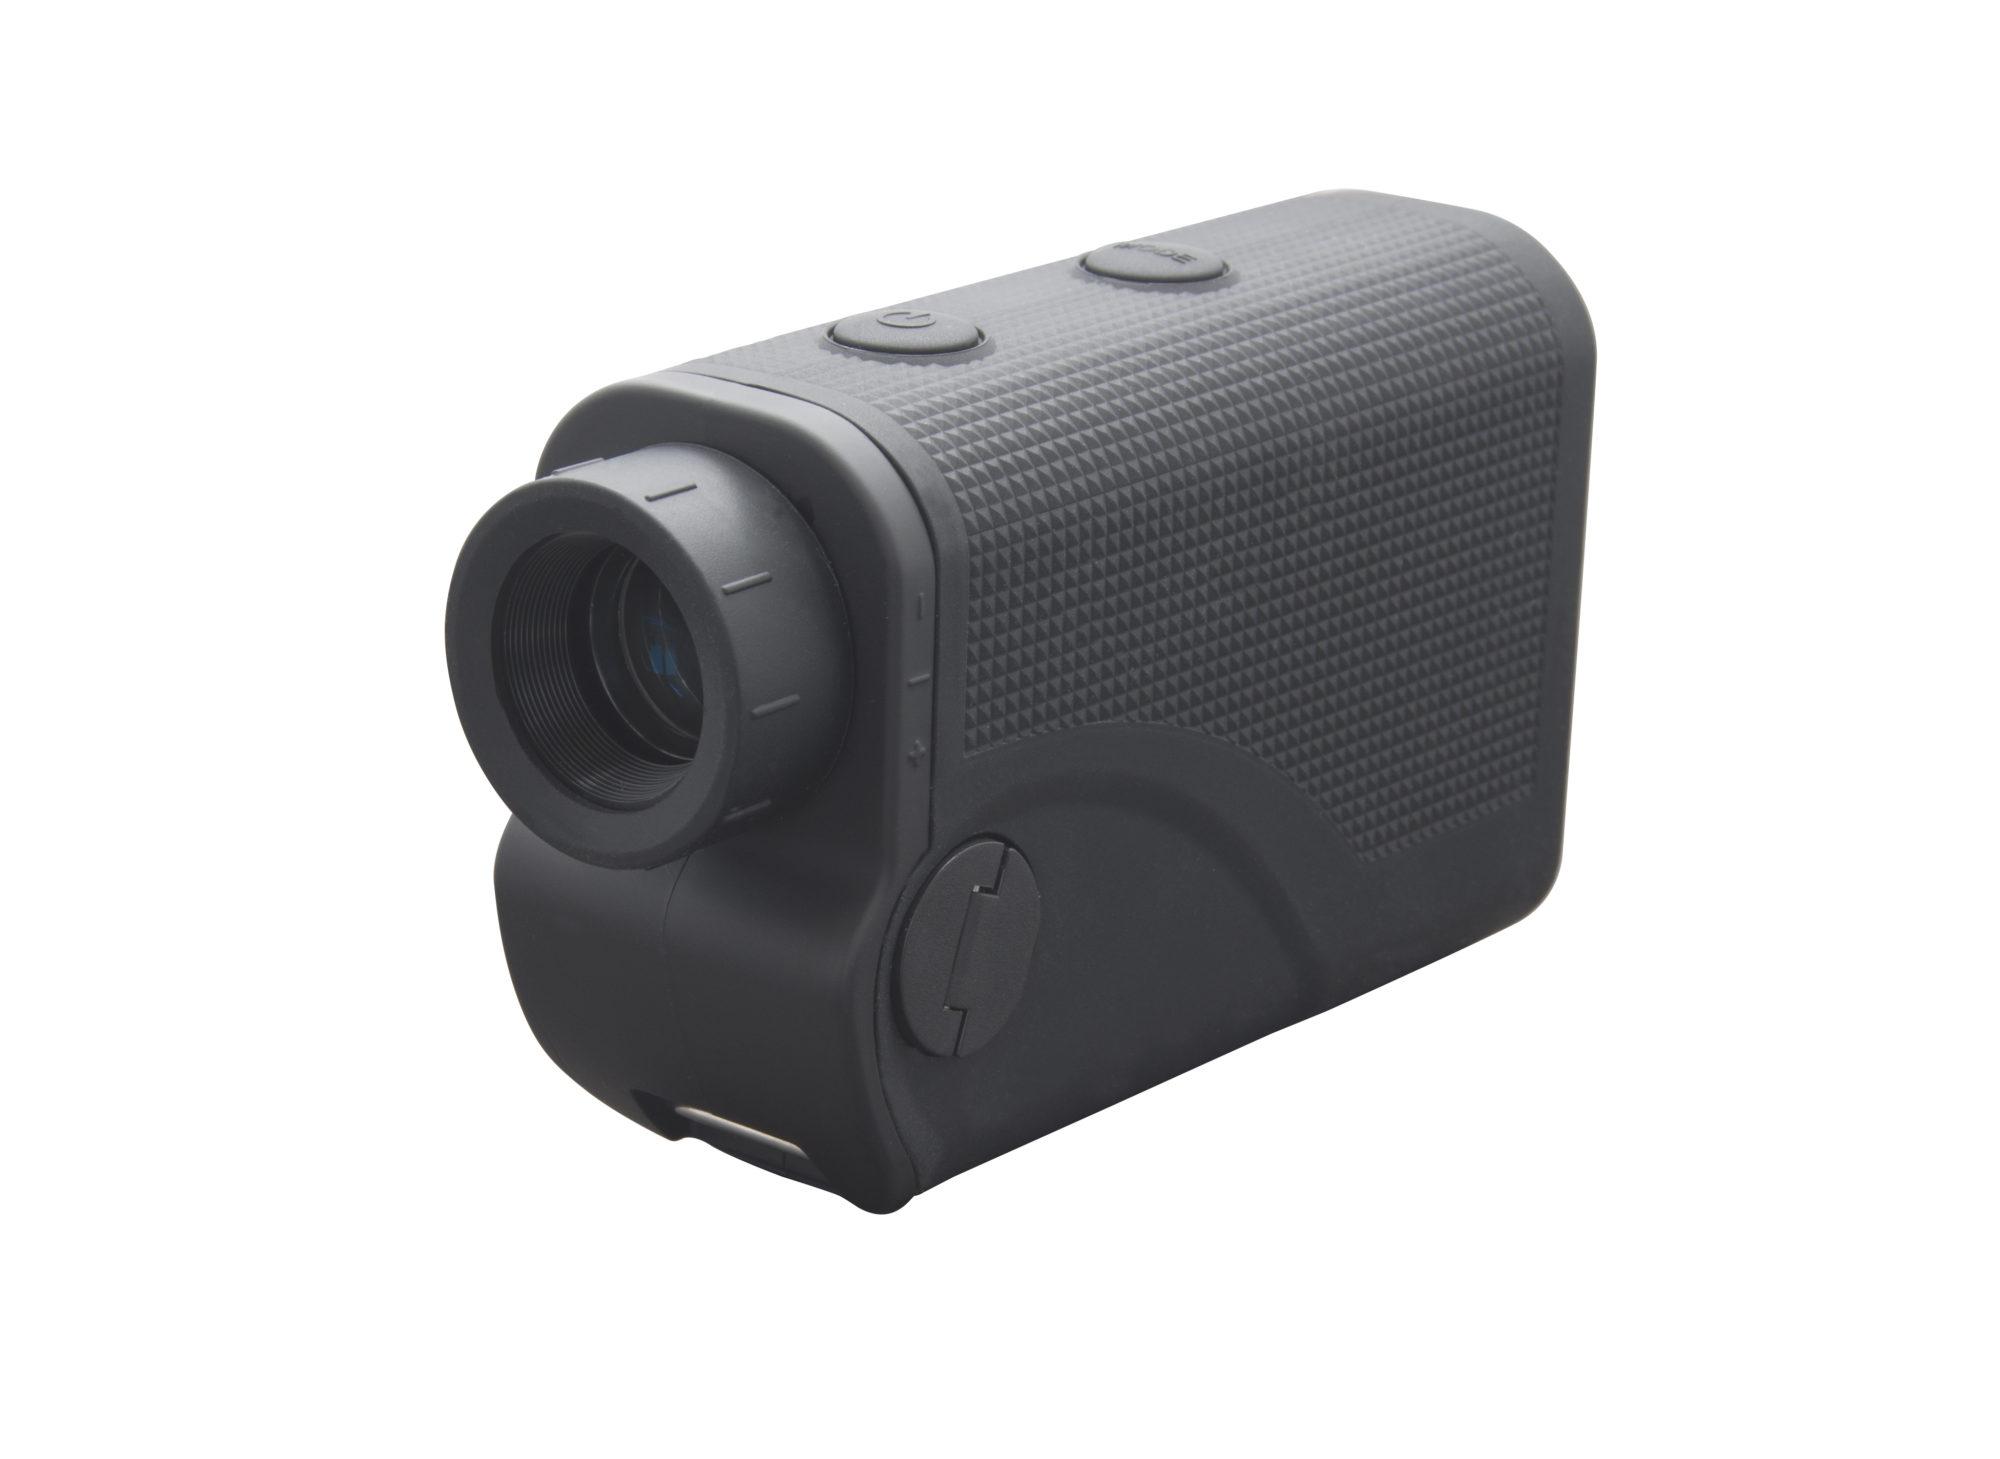 Golf Entfernungsmesser Nikon : Golf entfernungsmesser